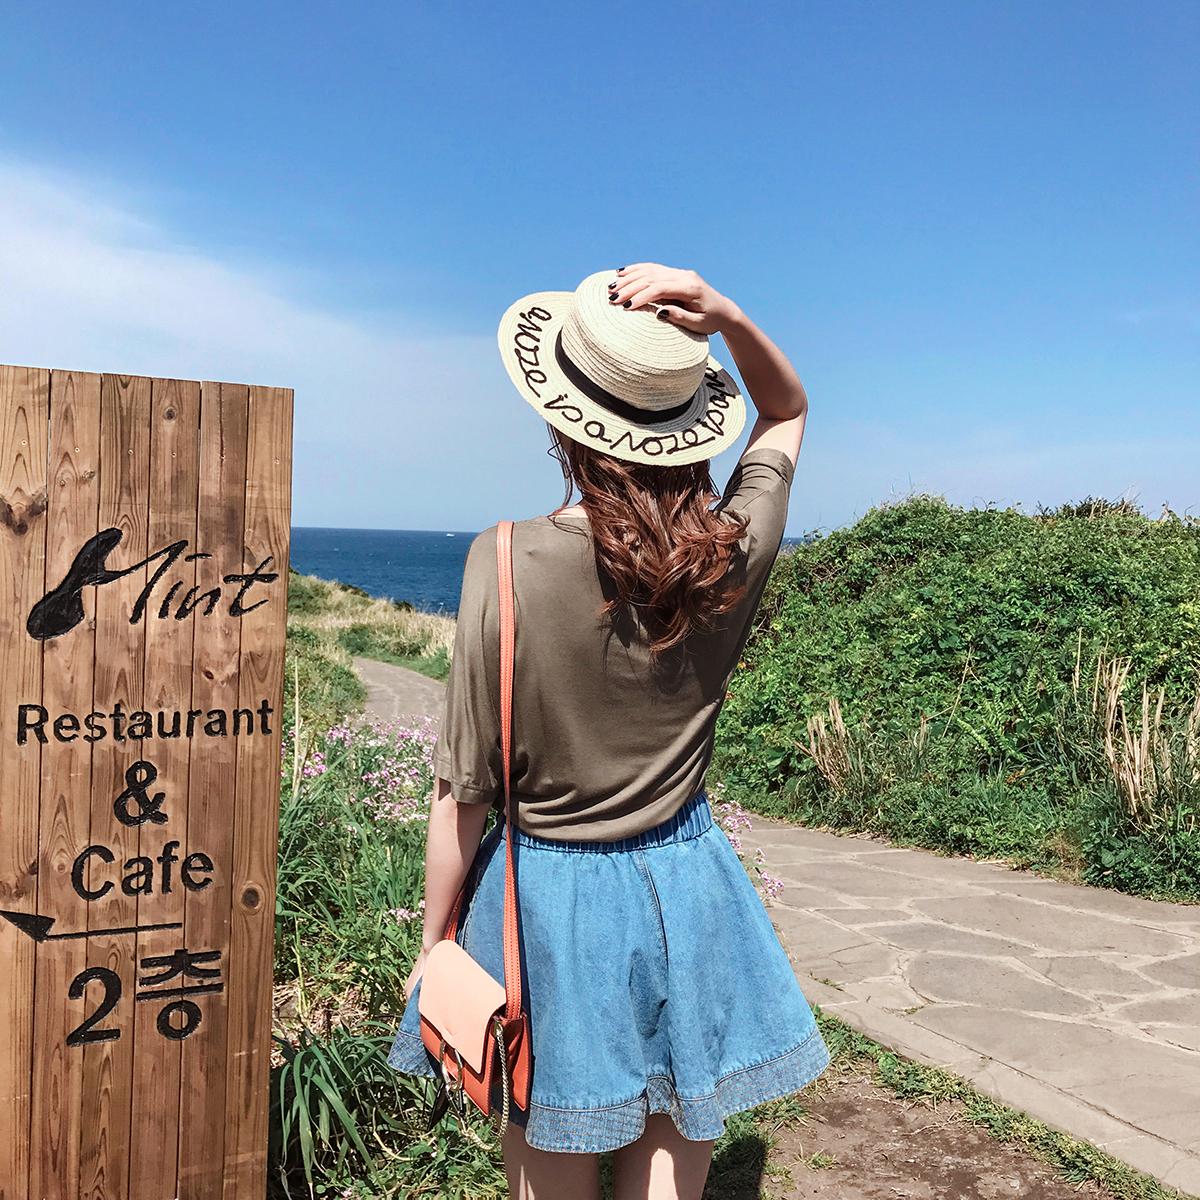 ◆MUGU蘑菇◆ 浅色宽松简单T恤女不规则个性打底衫短袖上衣女夏装1元优惠券